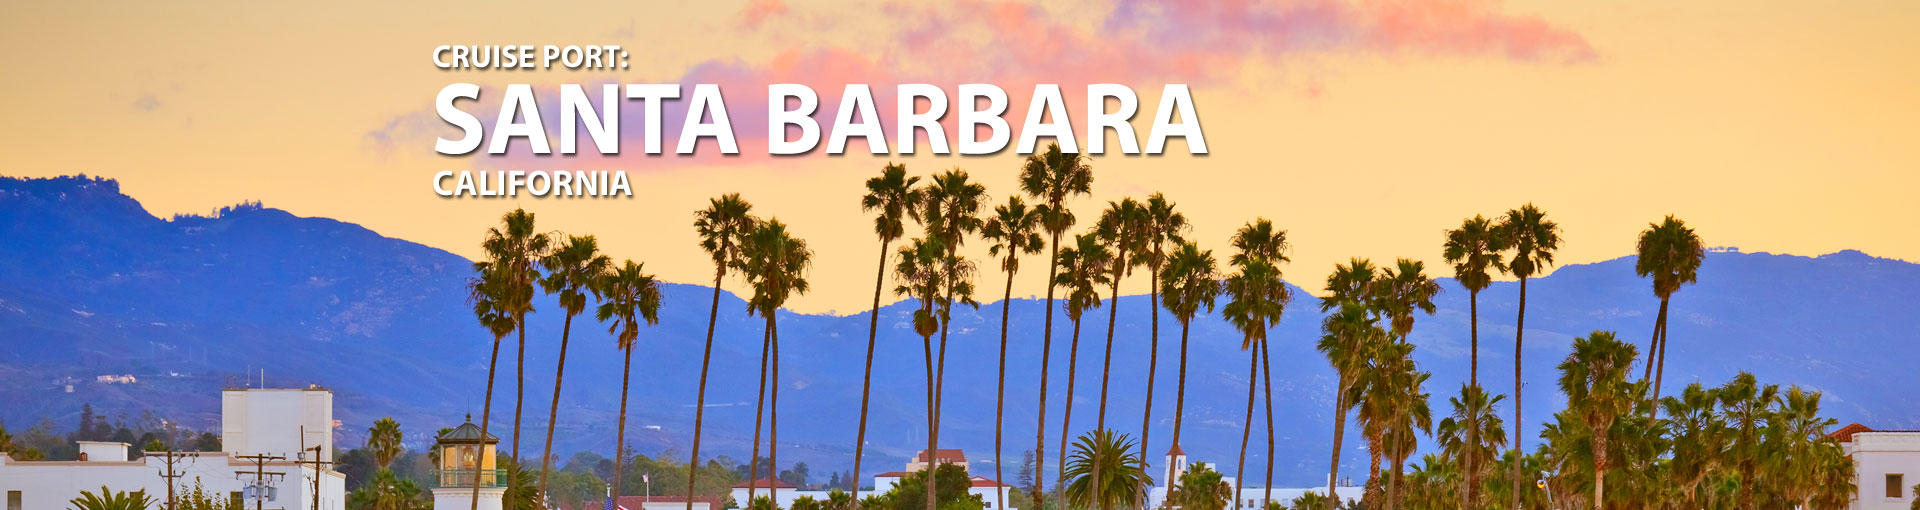 Cruises to Santa Barbara, California